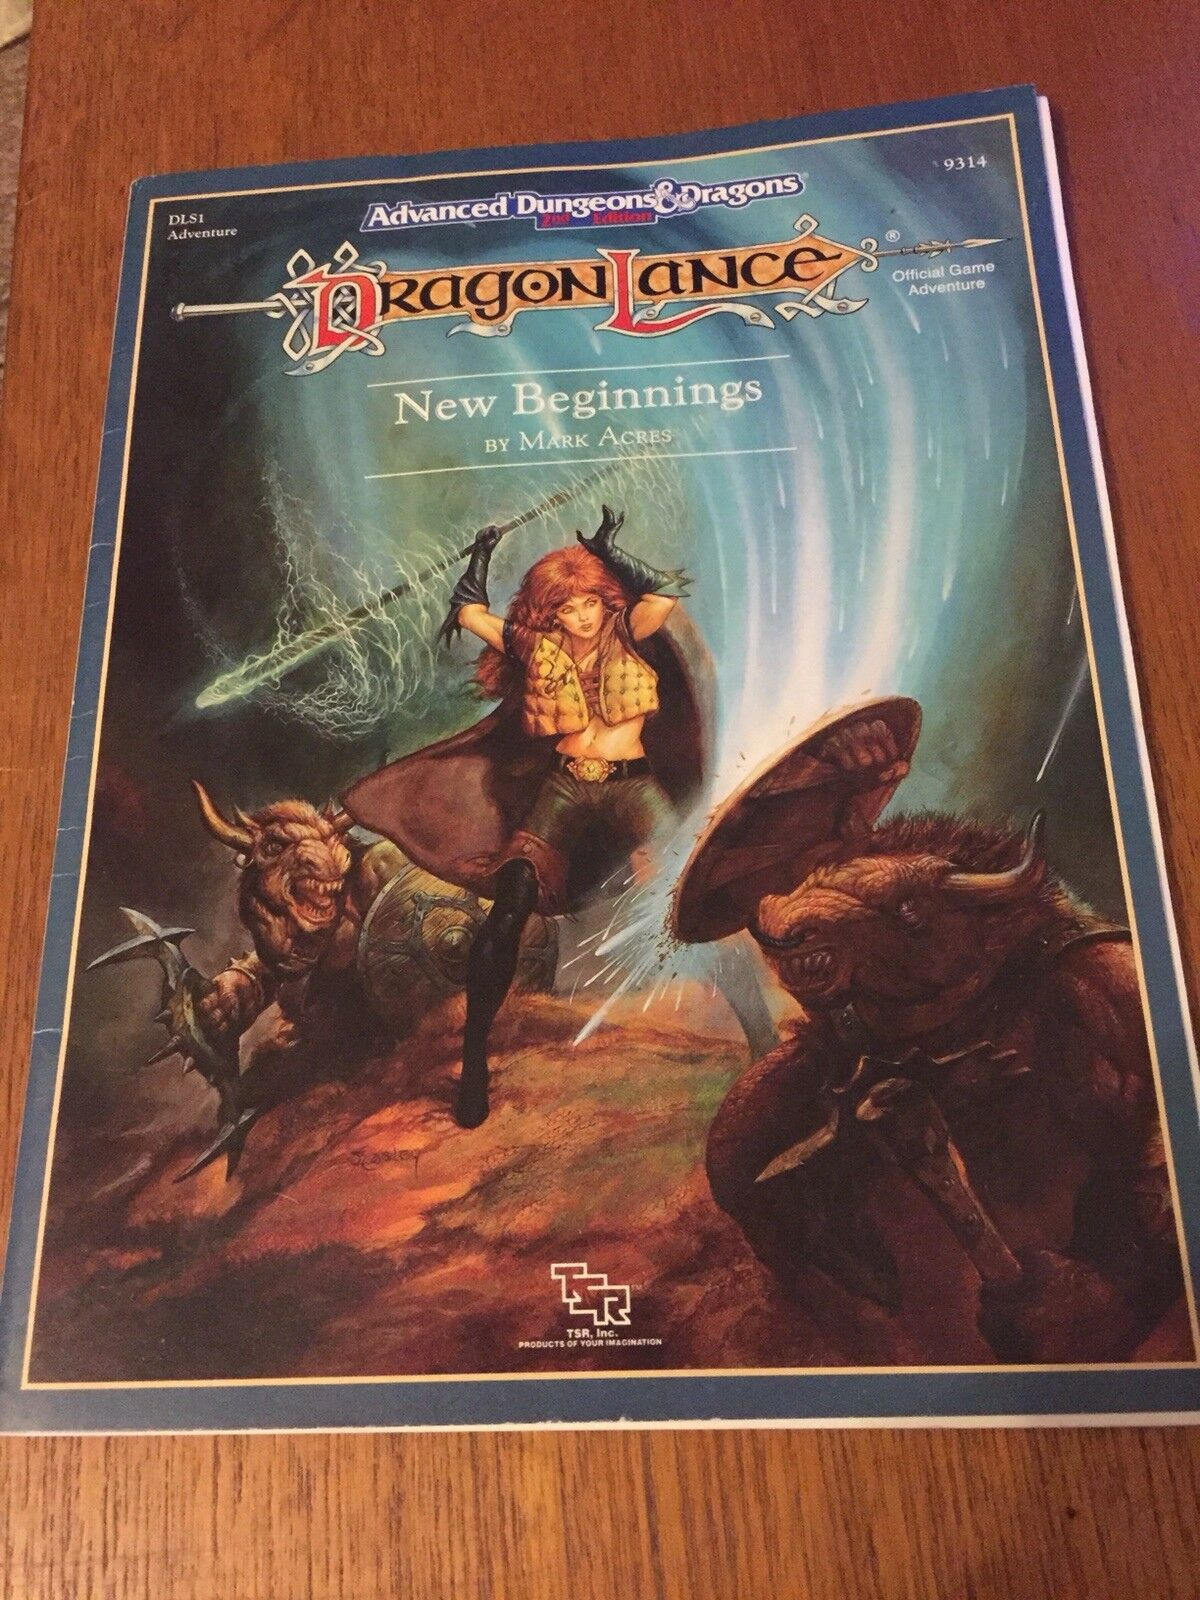 Advanced Dungeons and Dragons, Dragon Dragon Dragon Lance, New Beginnings DLS1 Adventure 07eba4